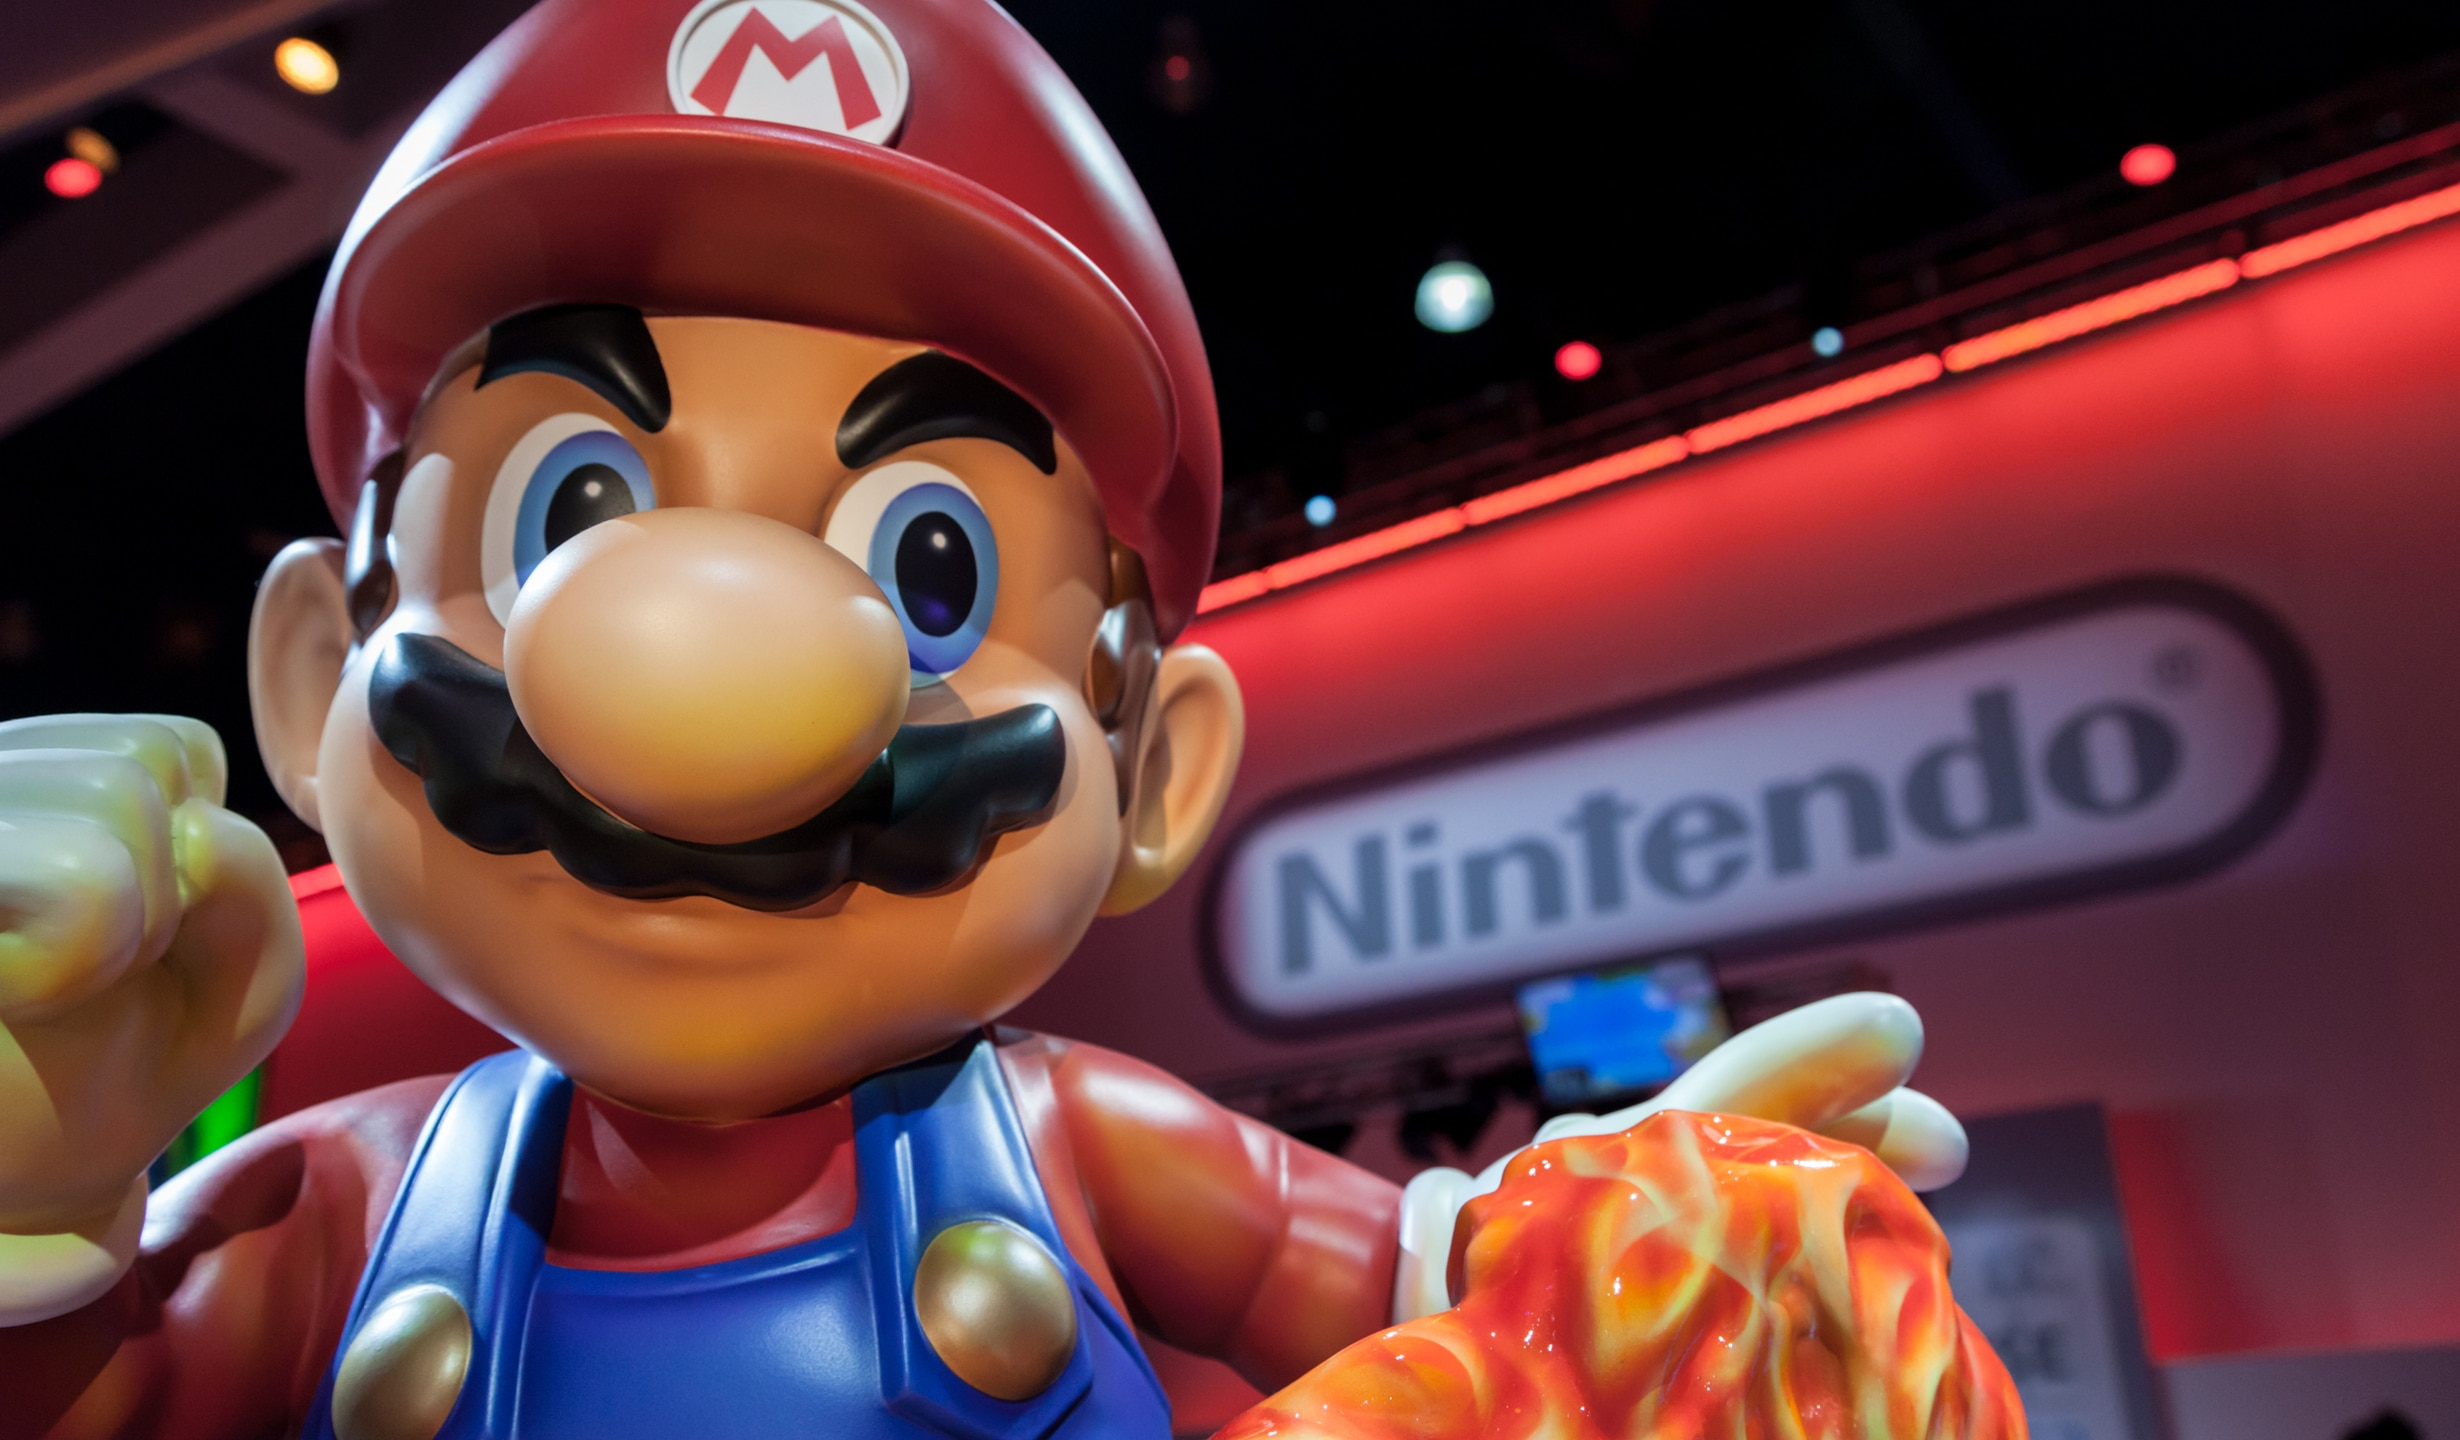 Nintendo Mario Stand